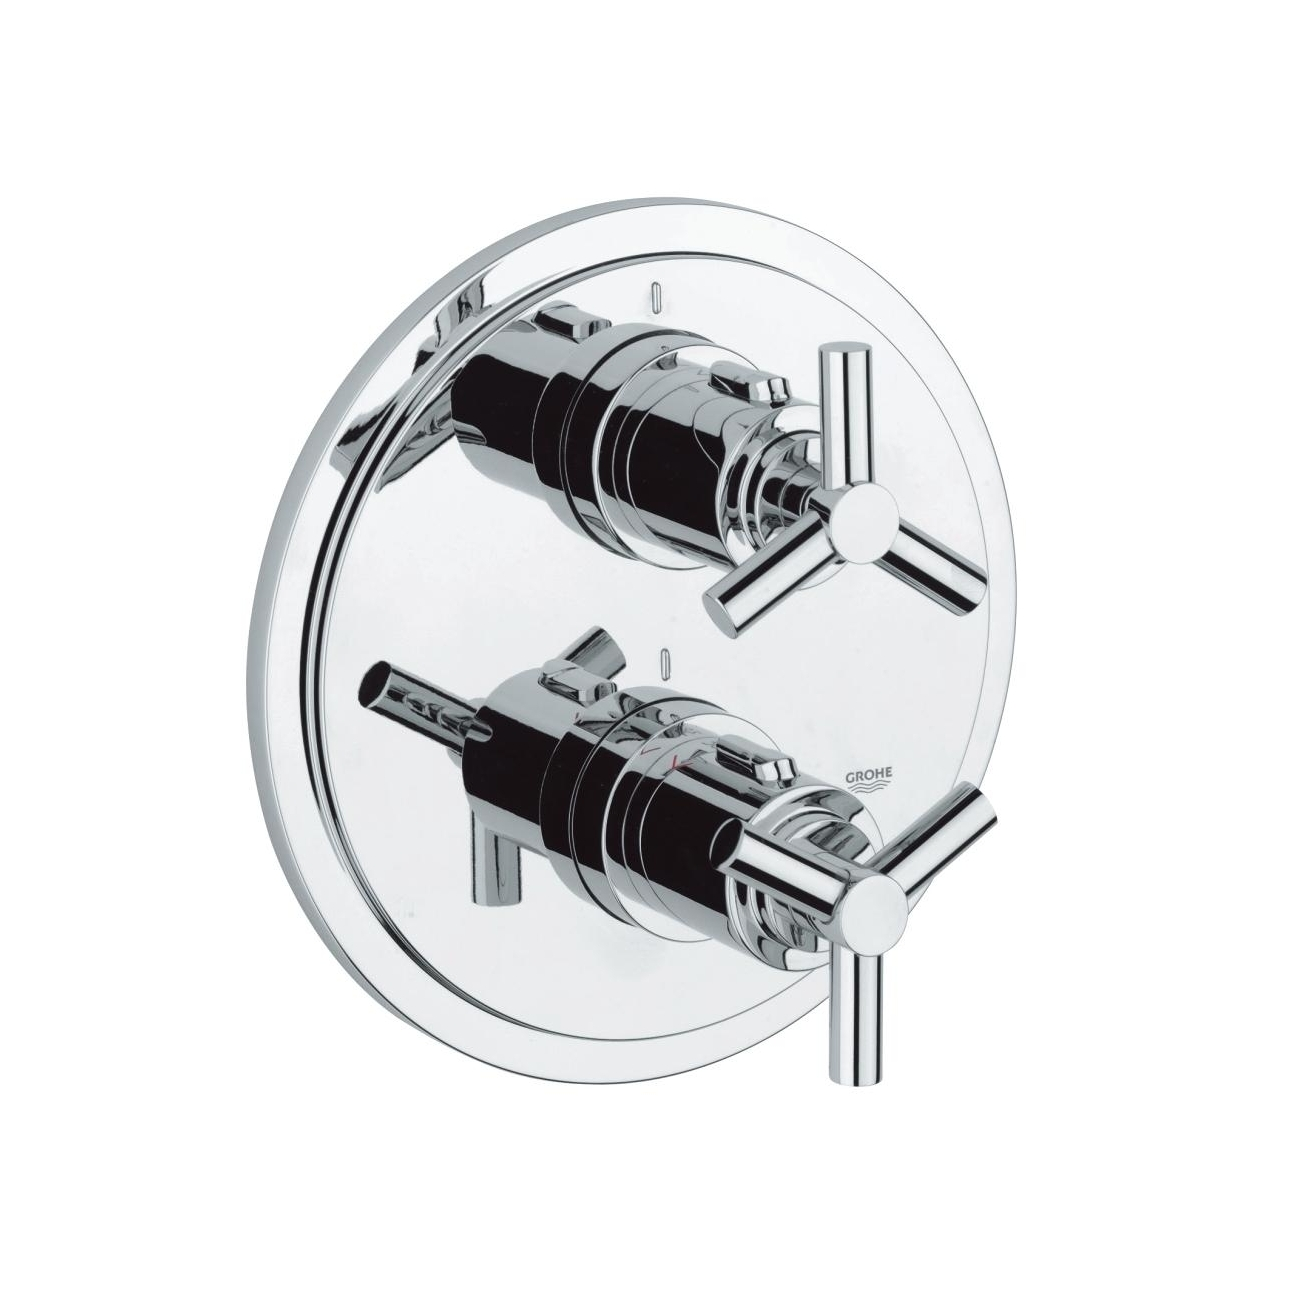 GROHE ATRIO Y Thermostatic shower mixer - TattaHome